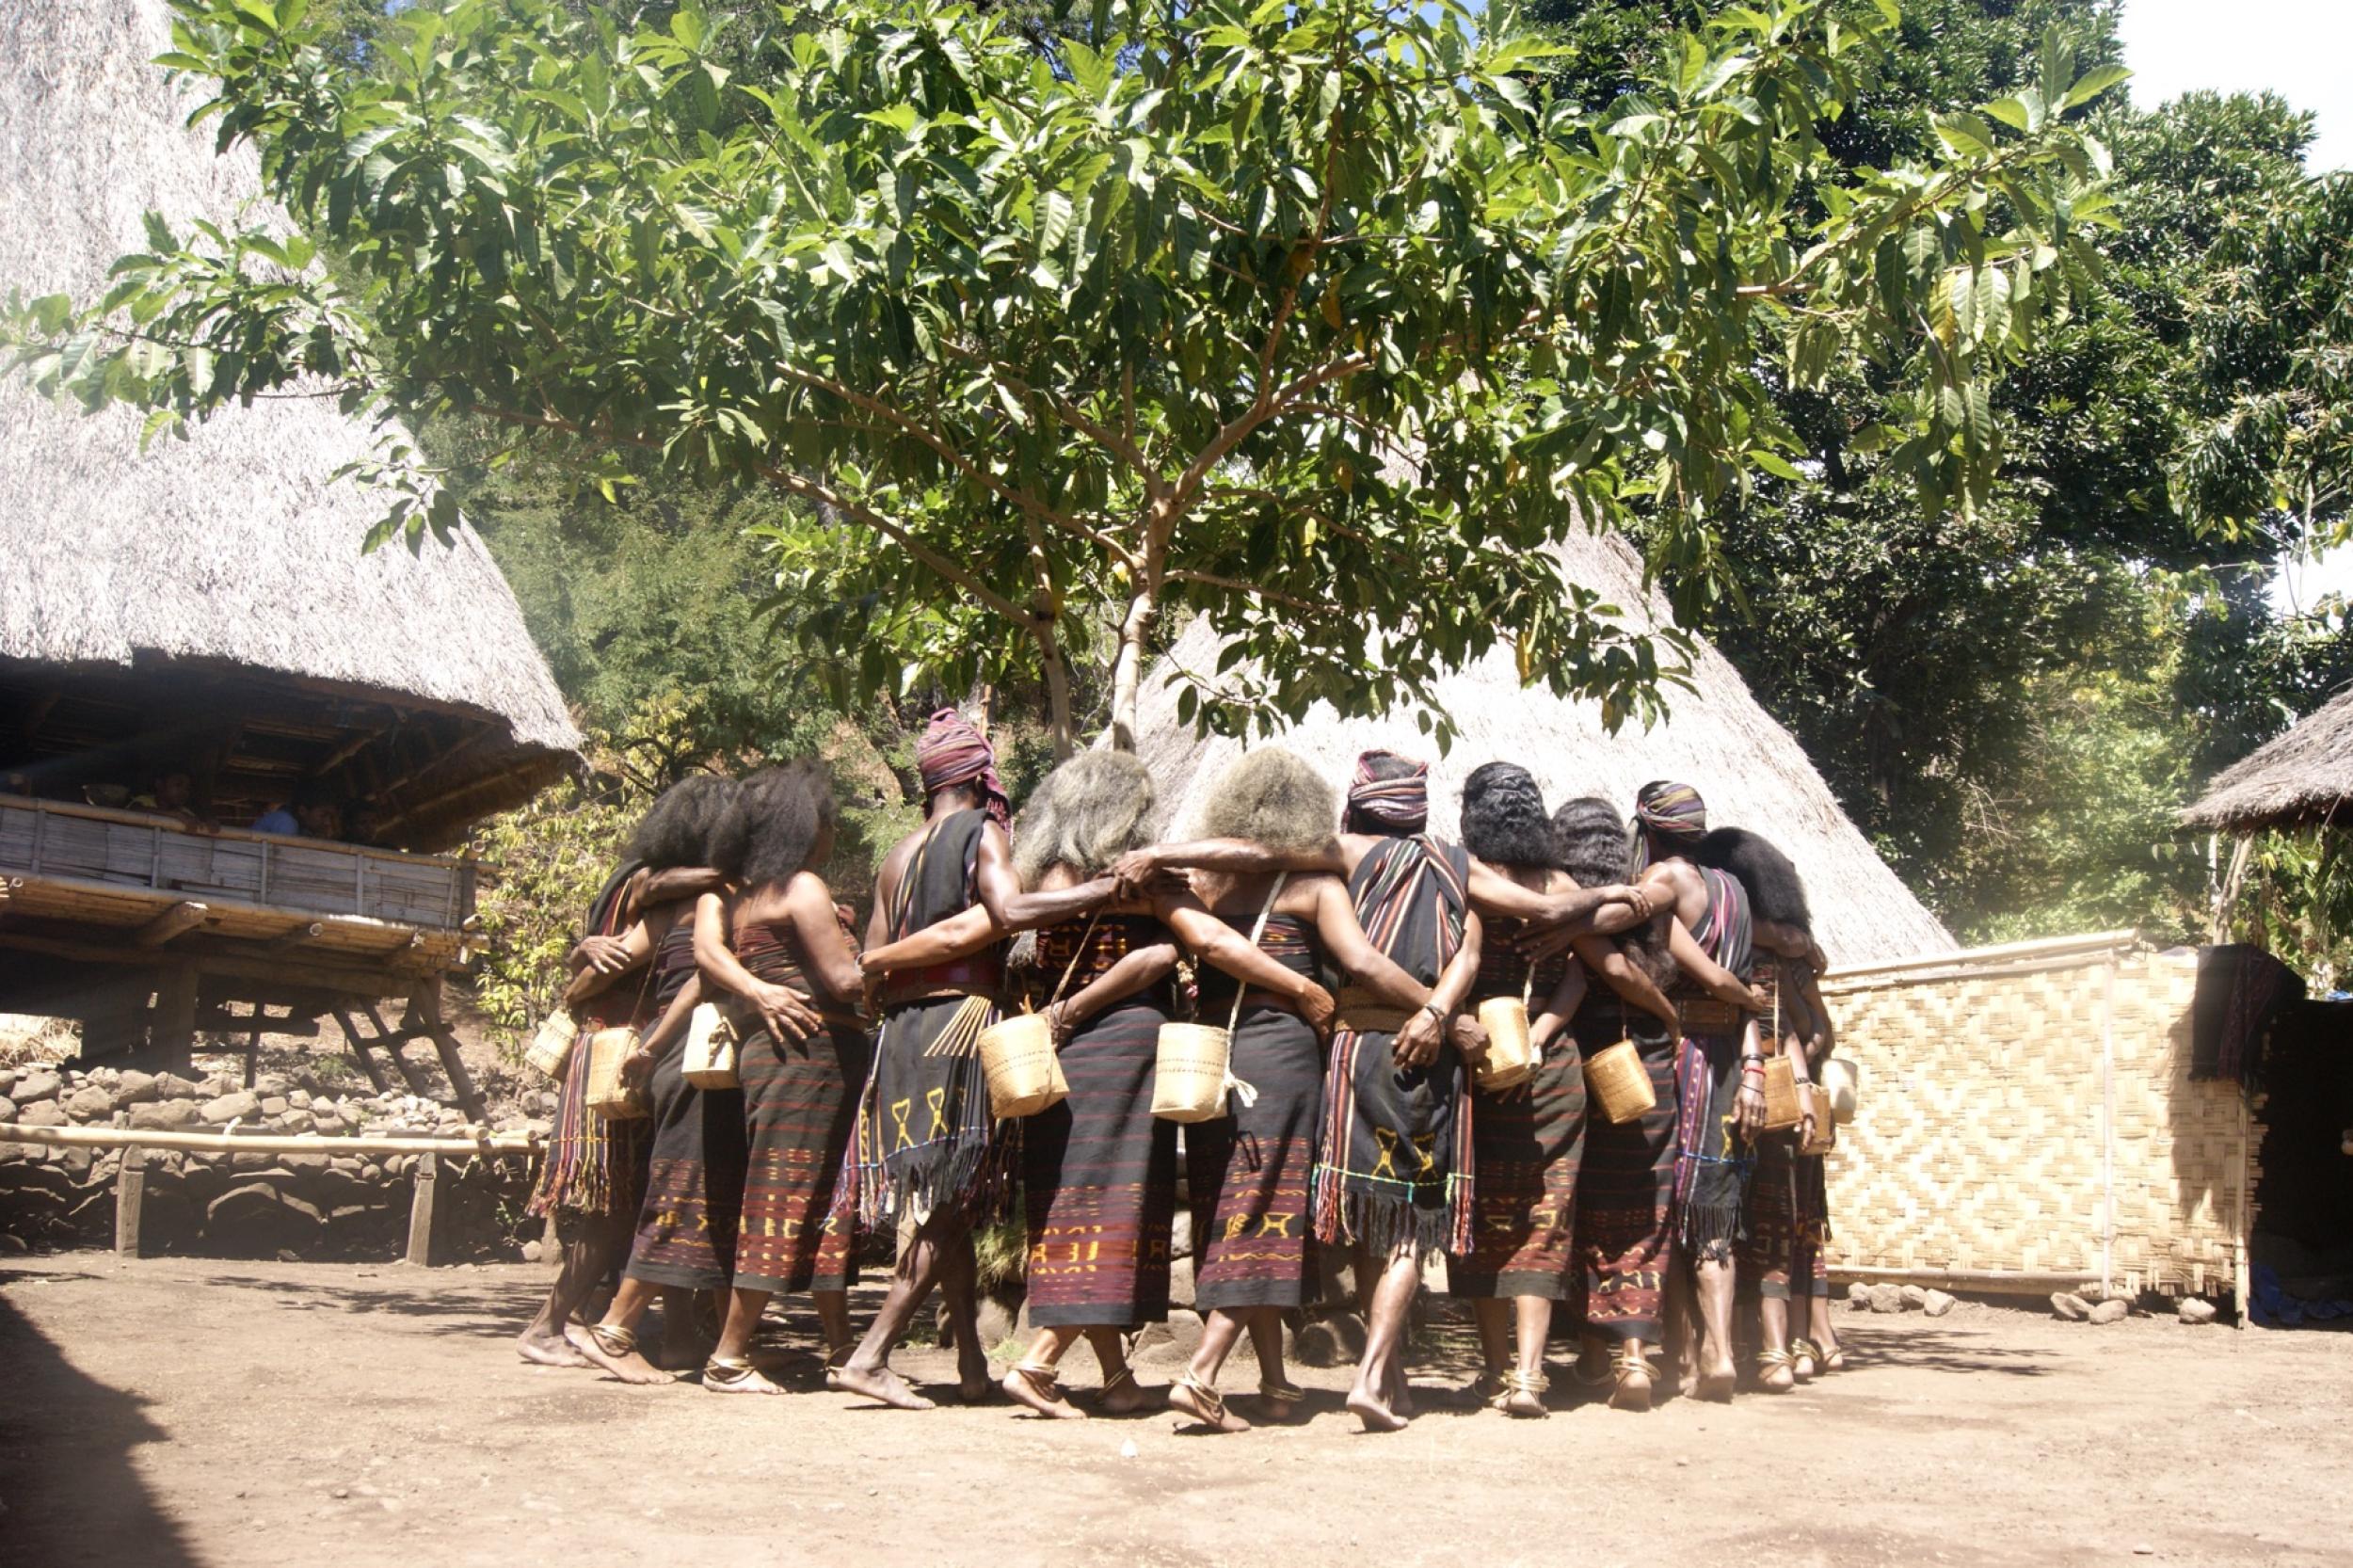 Takpala village dance lego2 1